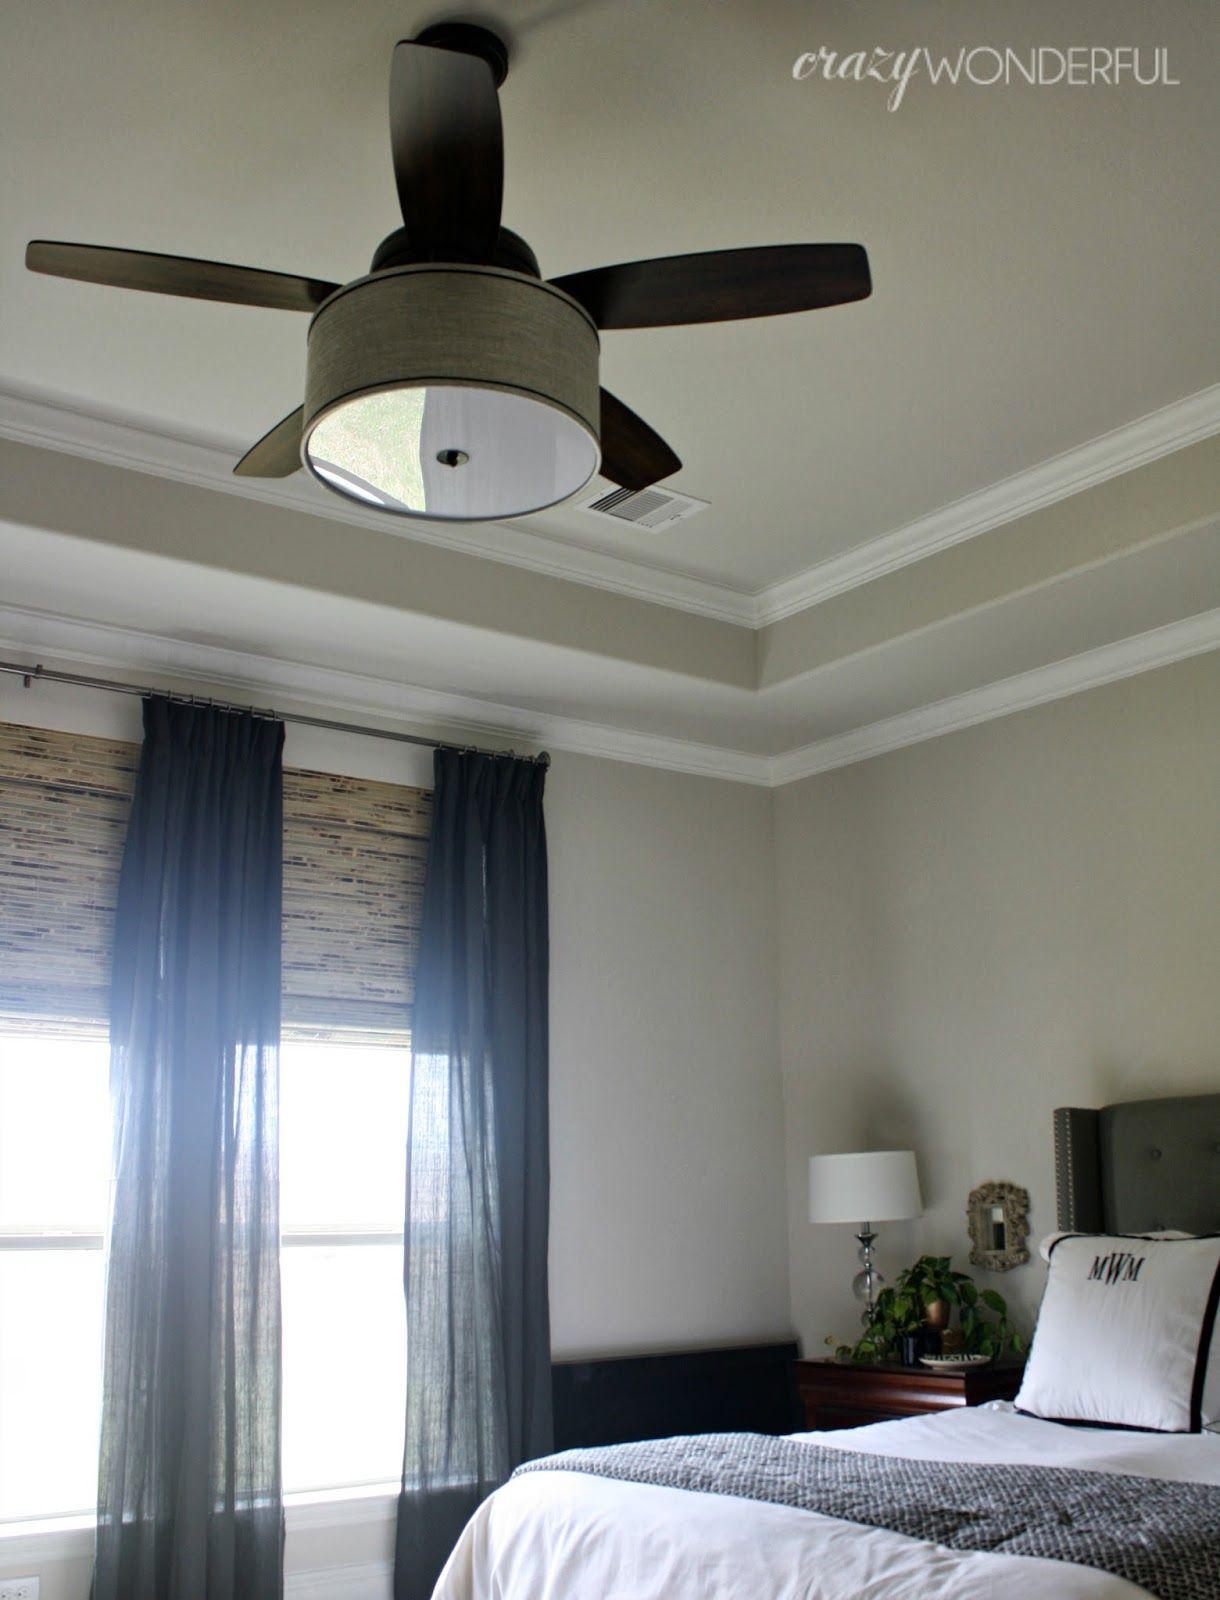 Diy Drum Shade Ceiling Fan Diy Drum Shade Bedroom Decor Lights Diy Drums